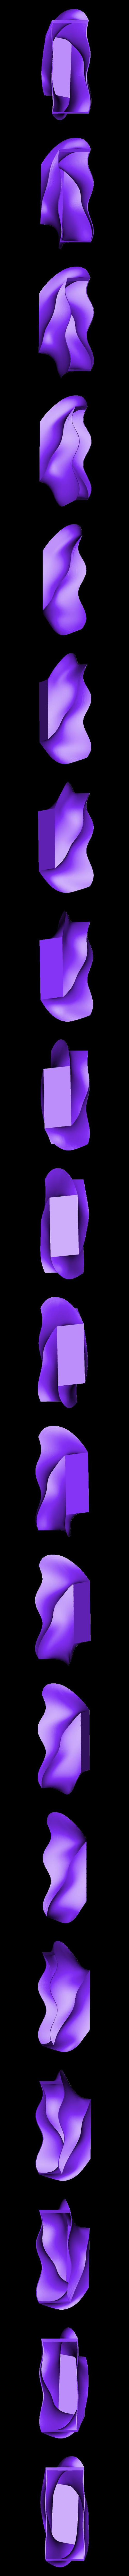 Bowl_11.STL Download free STL file Bowl 11 • Template to 3D print, David_Mussaffi